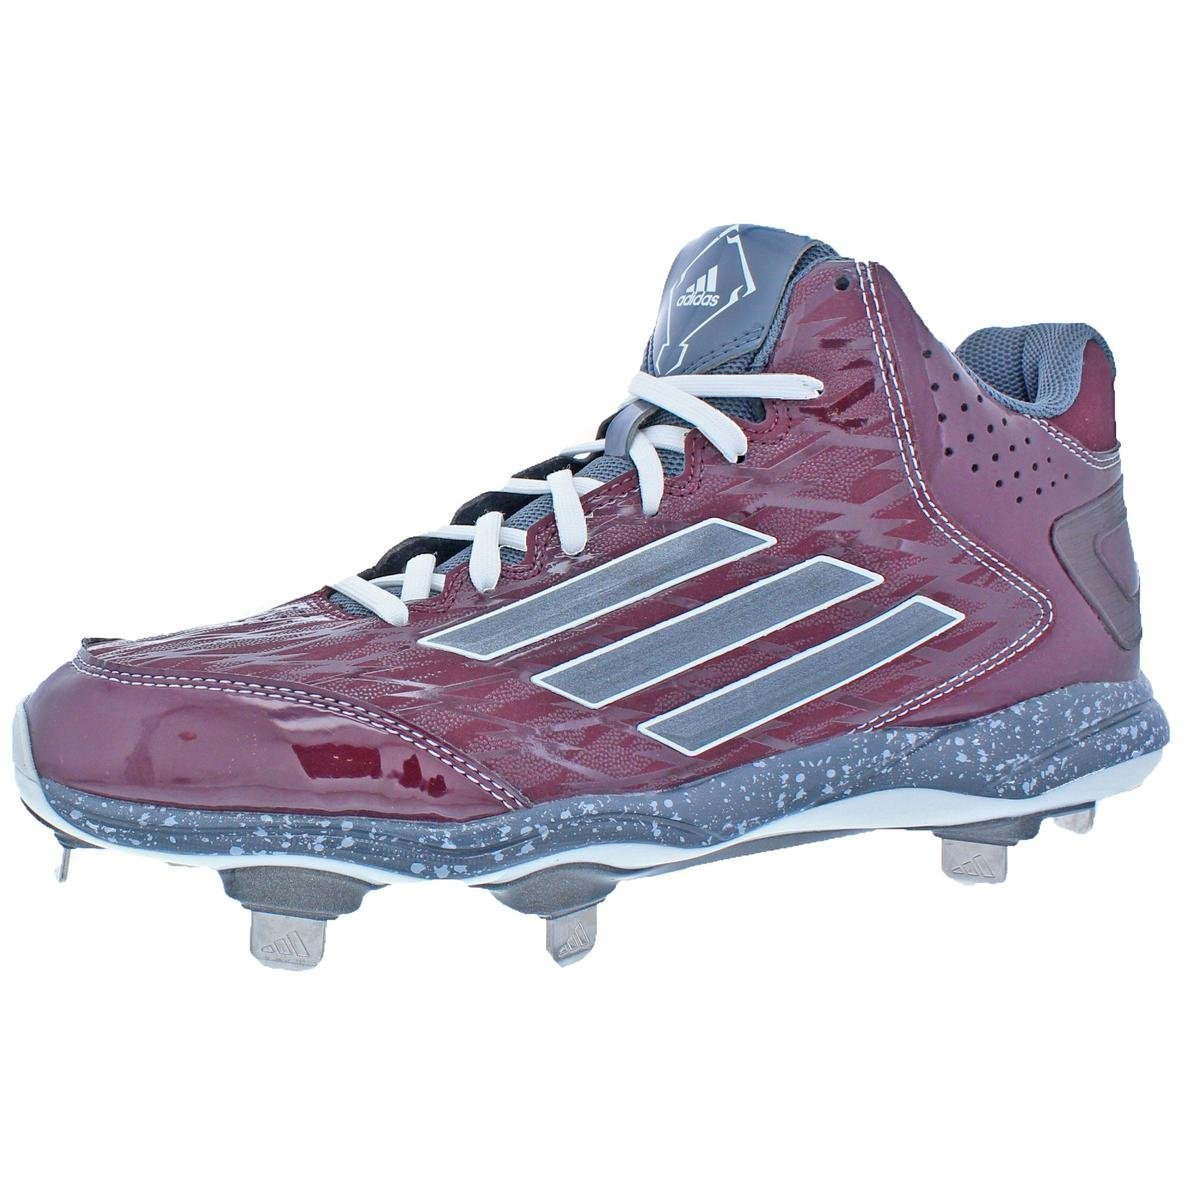 adidas Performance Men's PowerAlley 2 Mid Baseball Cleat B00MVPMGHW 8 D(M) US|Maroon/Onix/Carbon Metallic